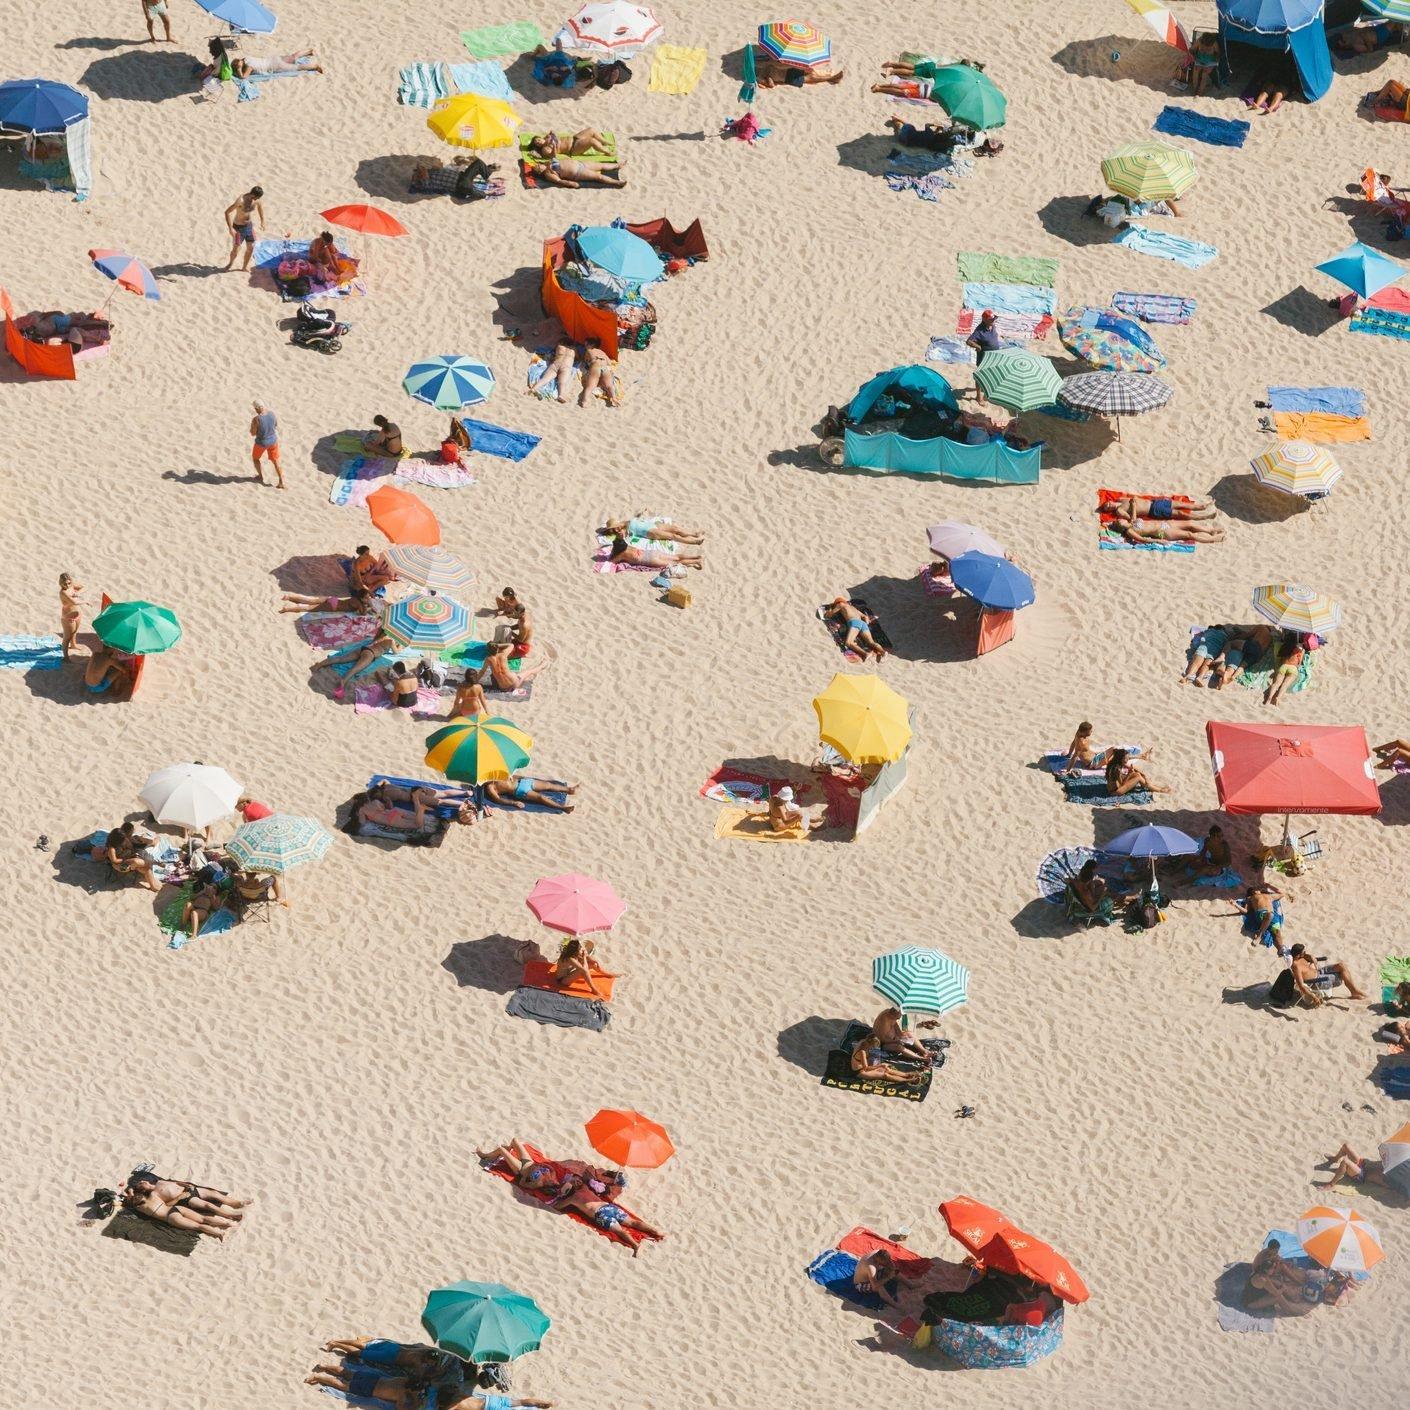 The 12 Best Beach Umbrellas for Summer That Won't Blow Away